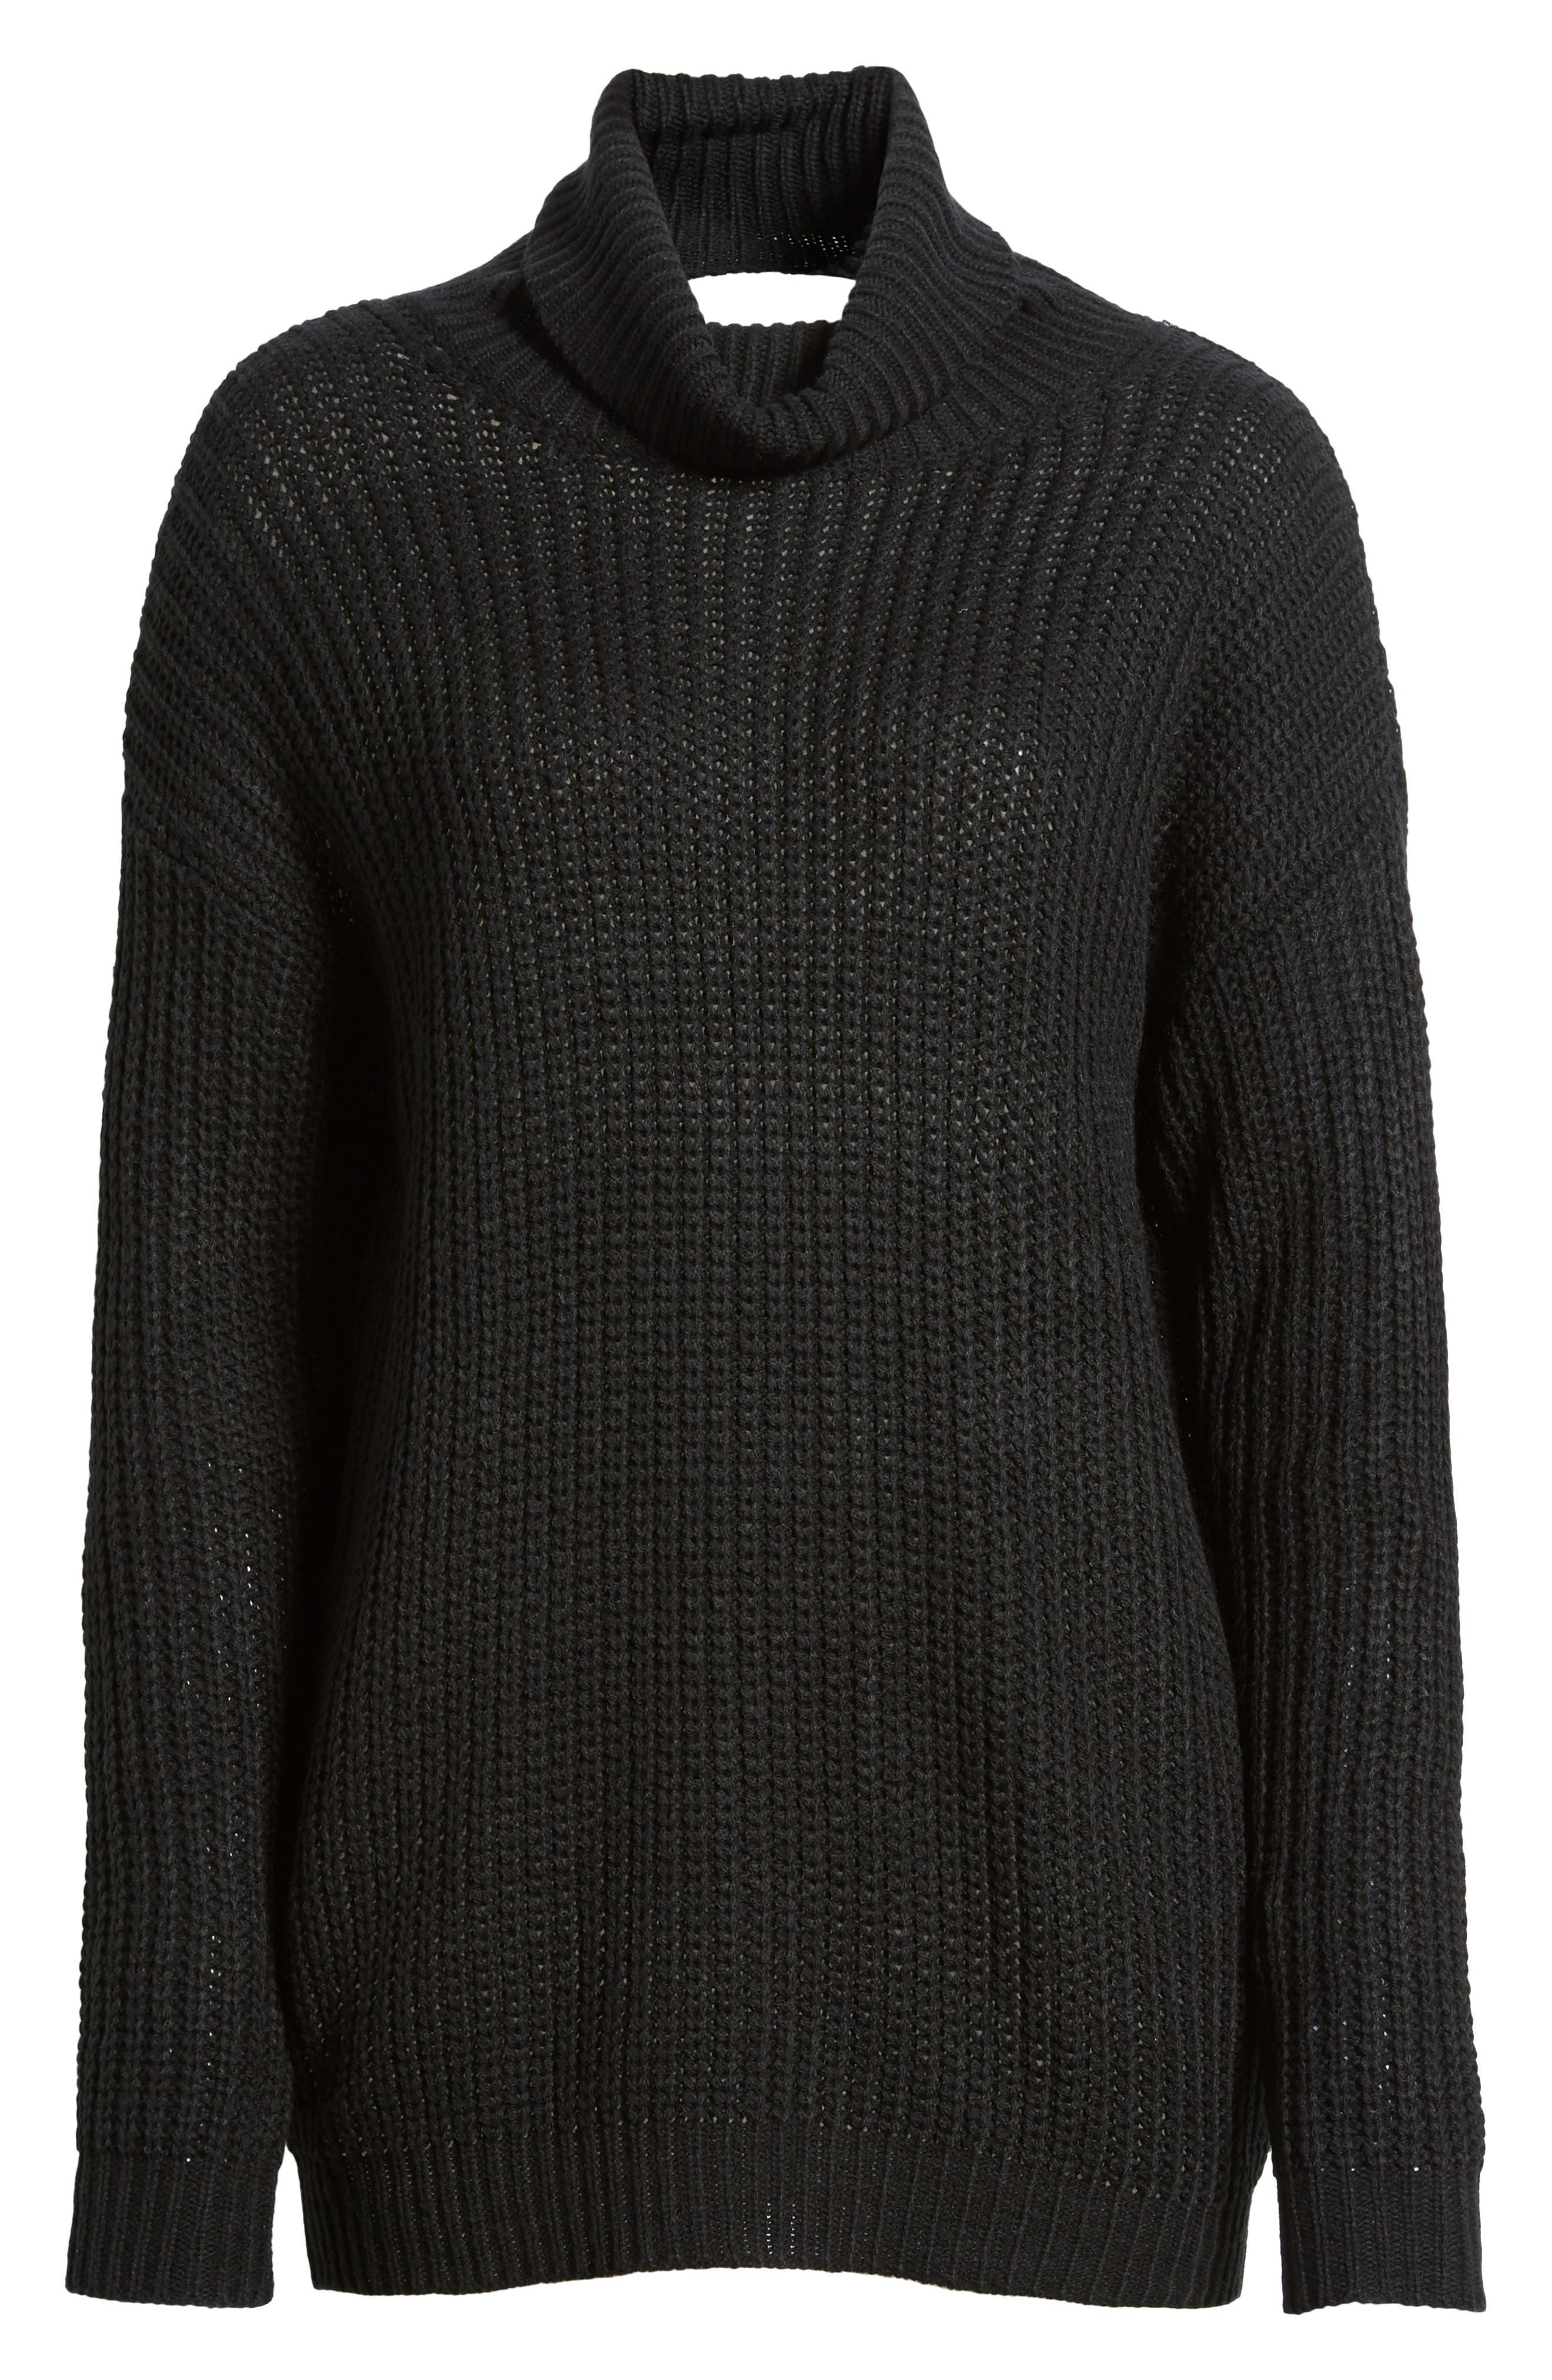 Sonya Open Back Sweater,                             Alternate thumbnail 6, color,                             001